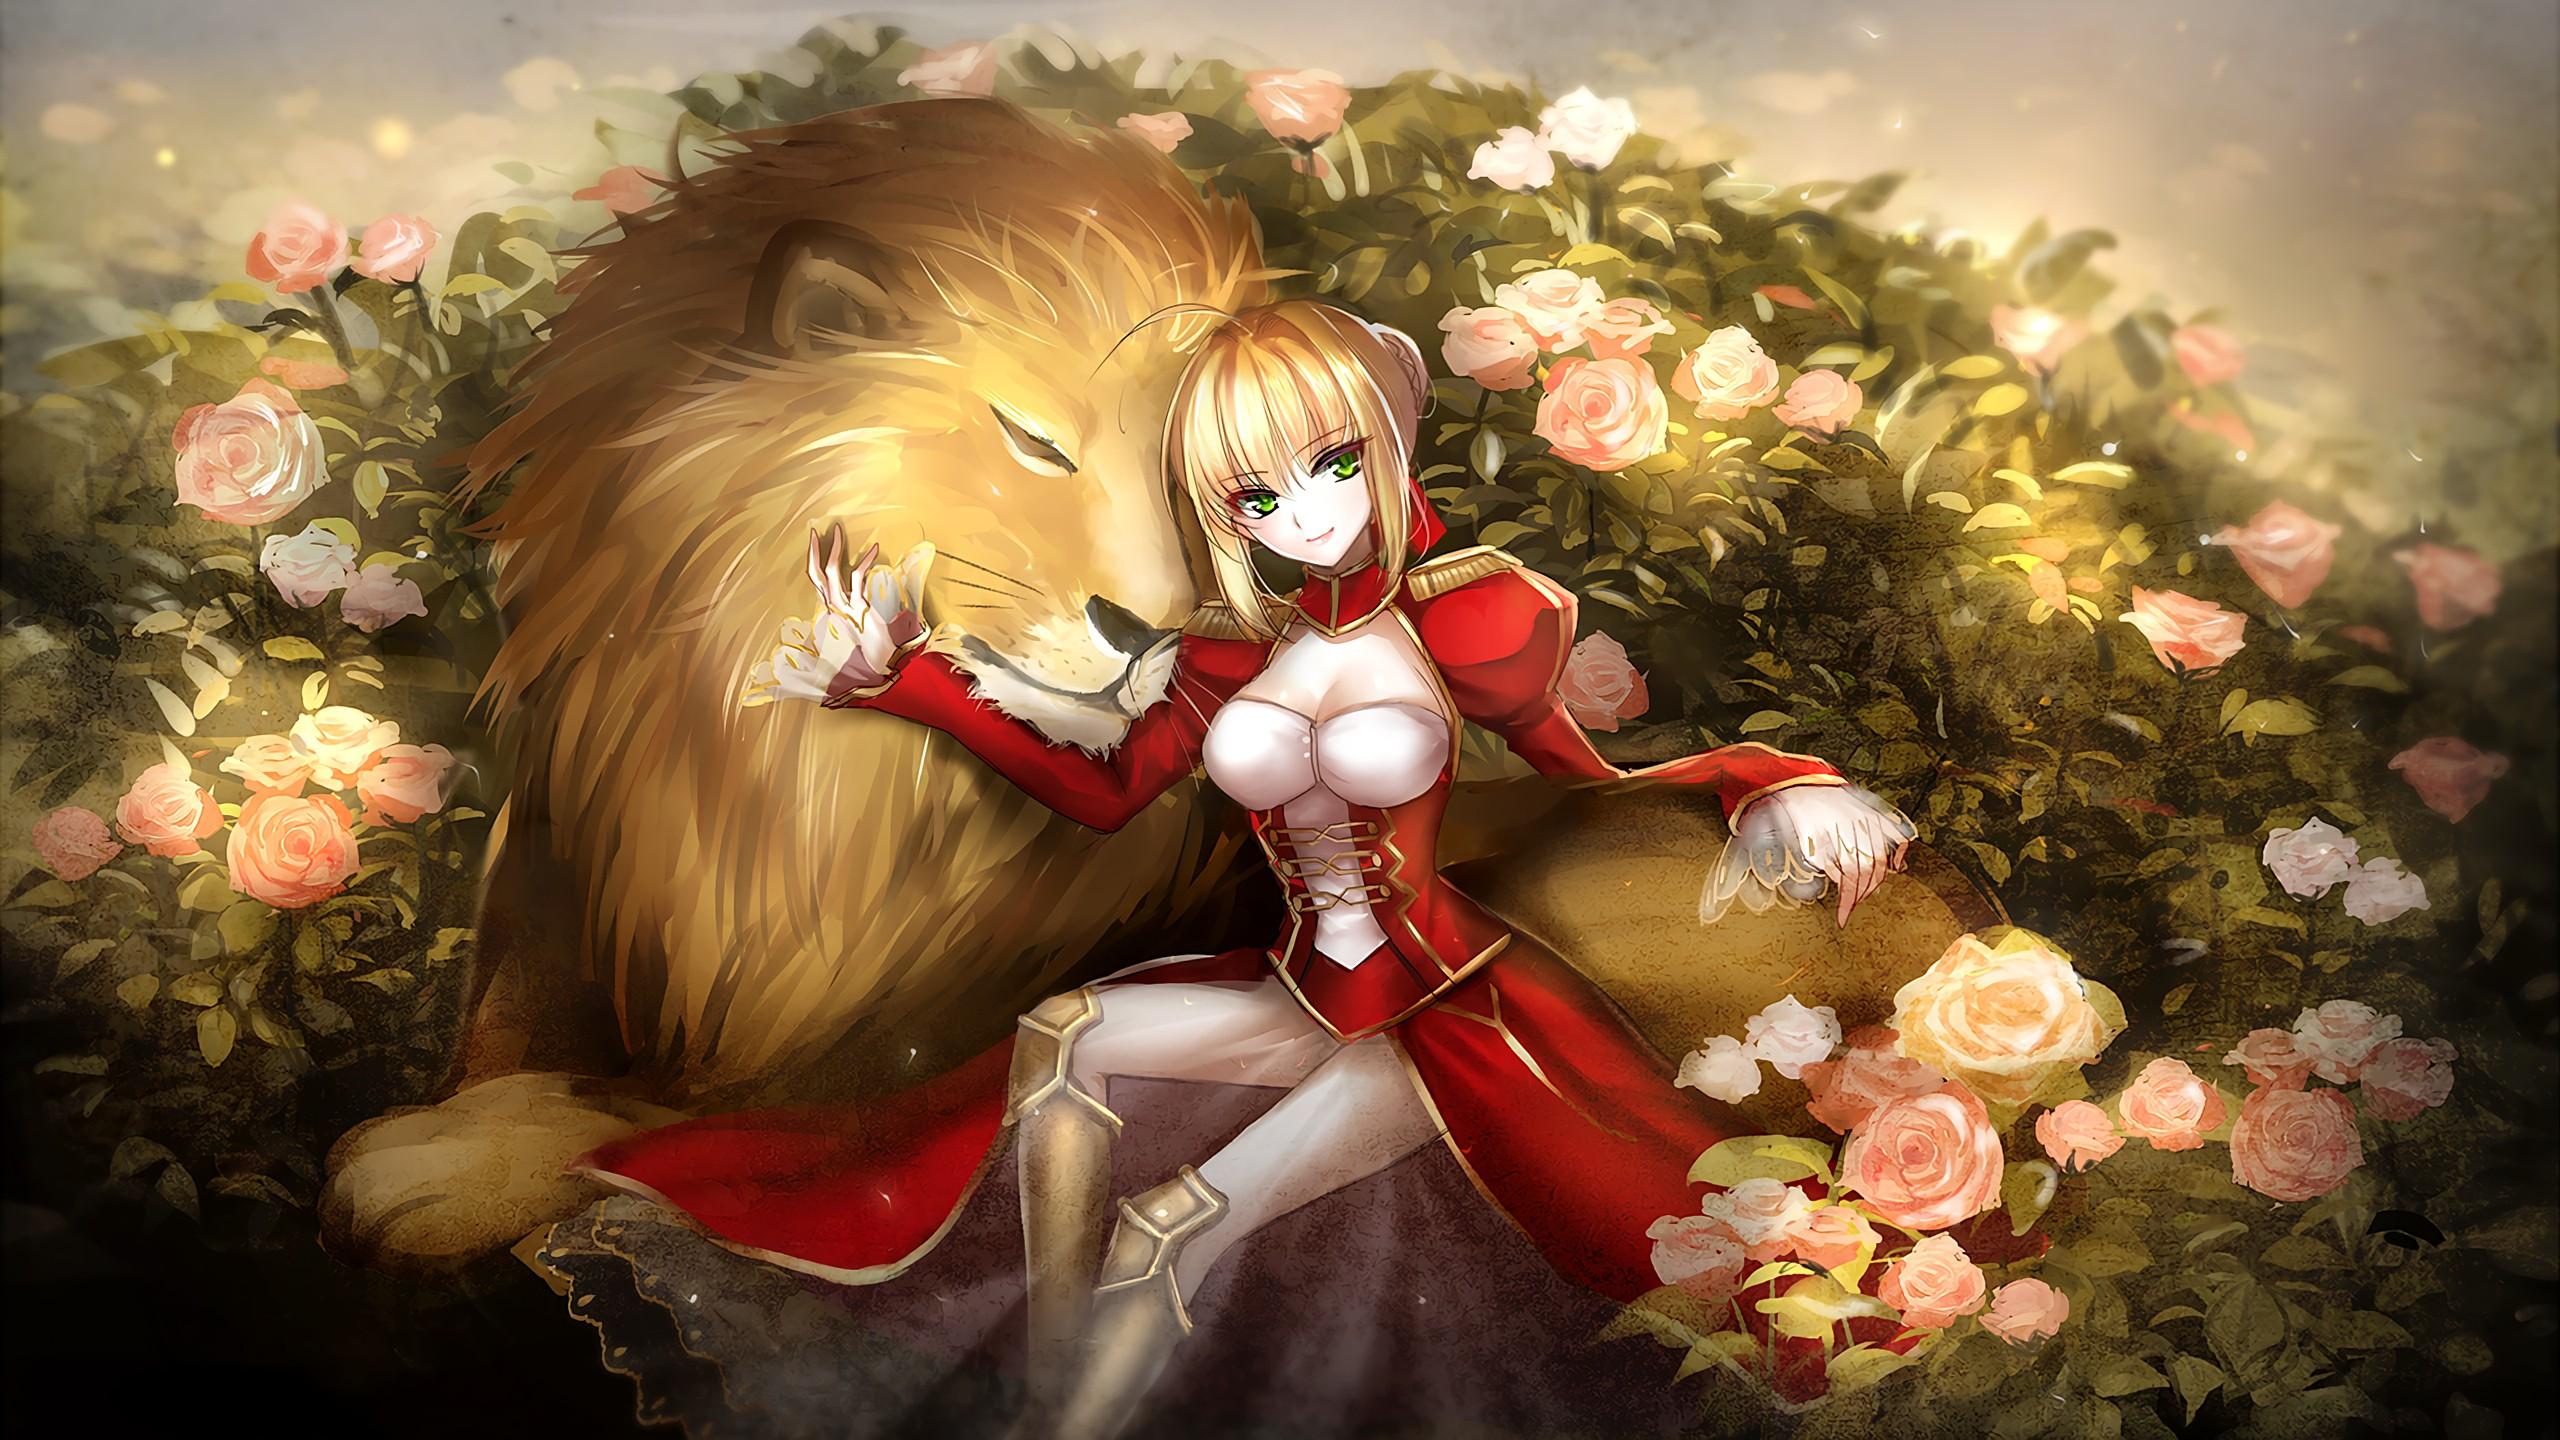 Cute Sad Crying Girl Wallpaper Saber Extra Video Games Anime Girls Saber Anime Lion